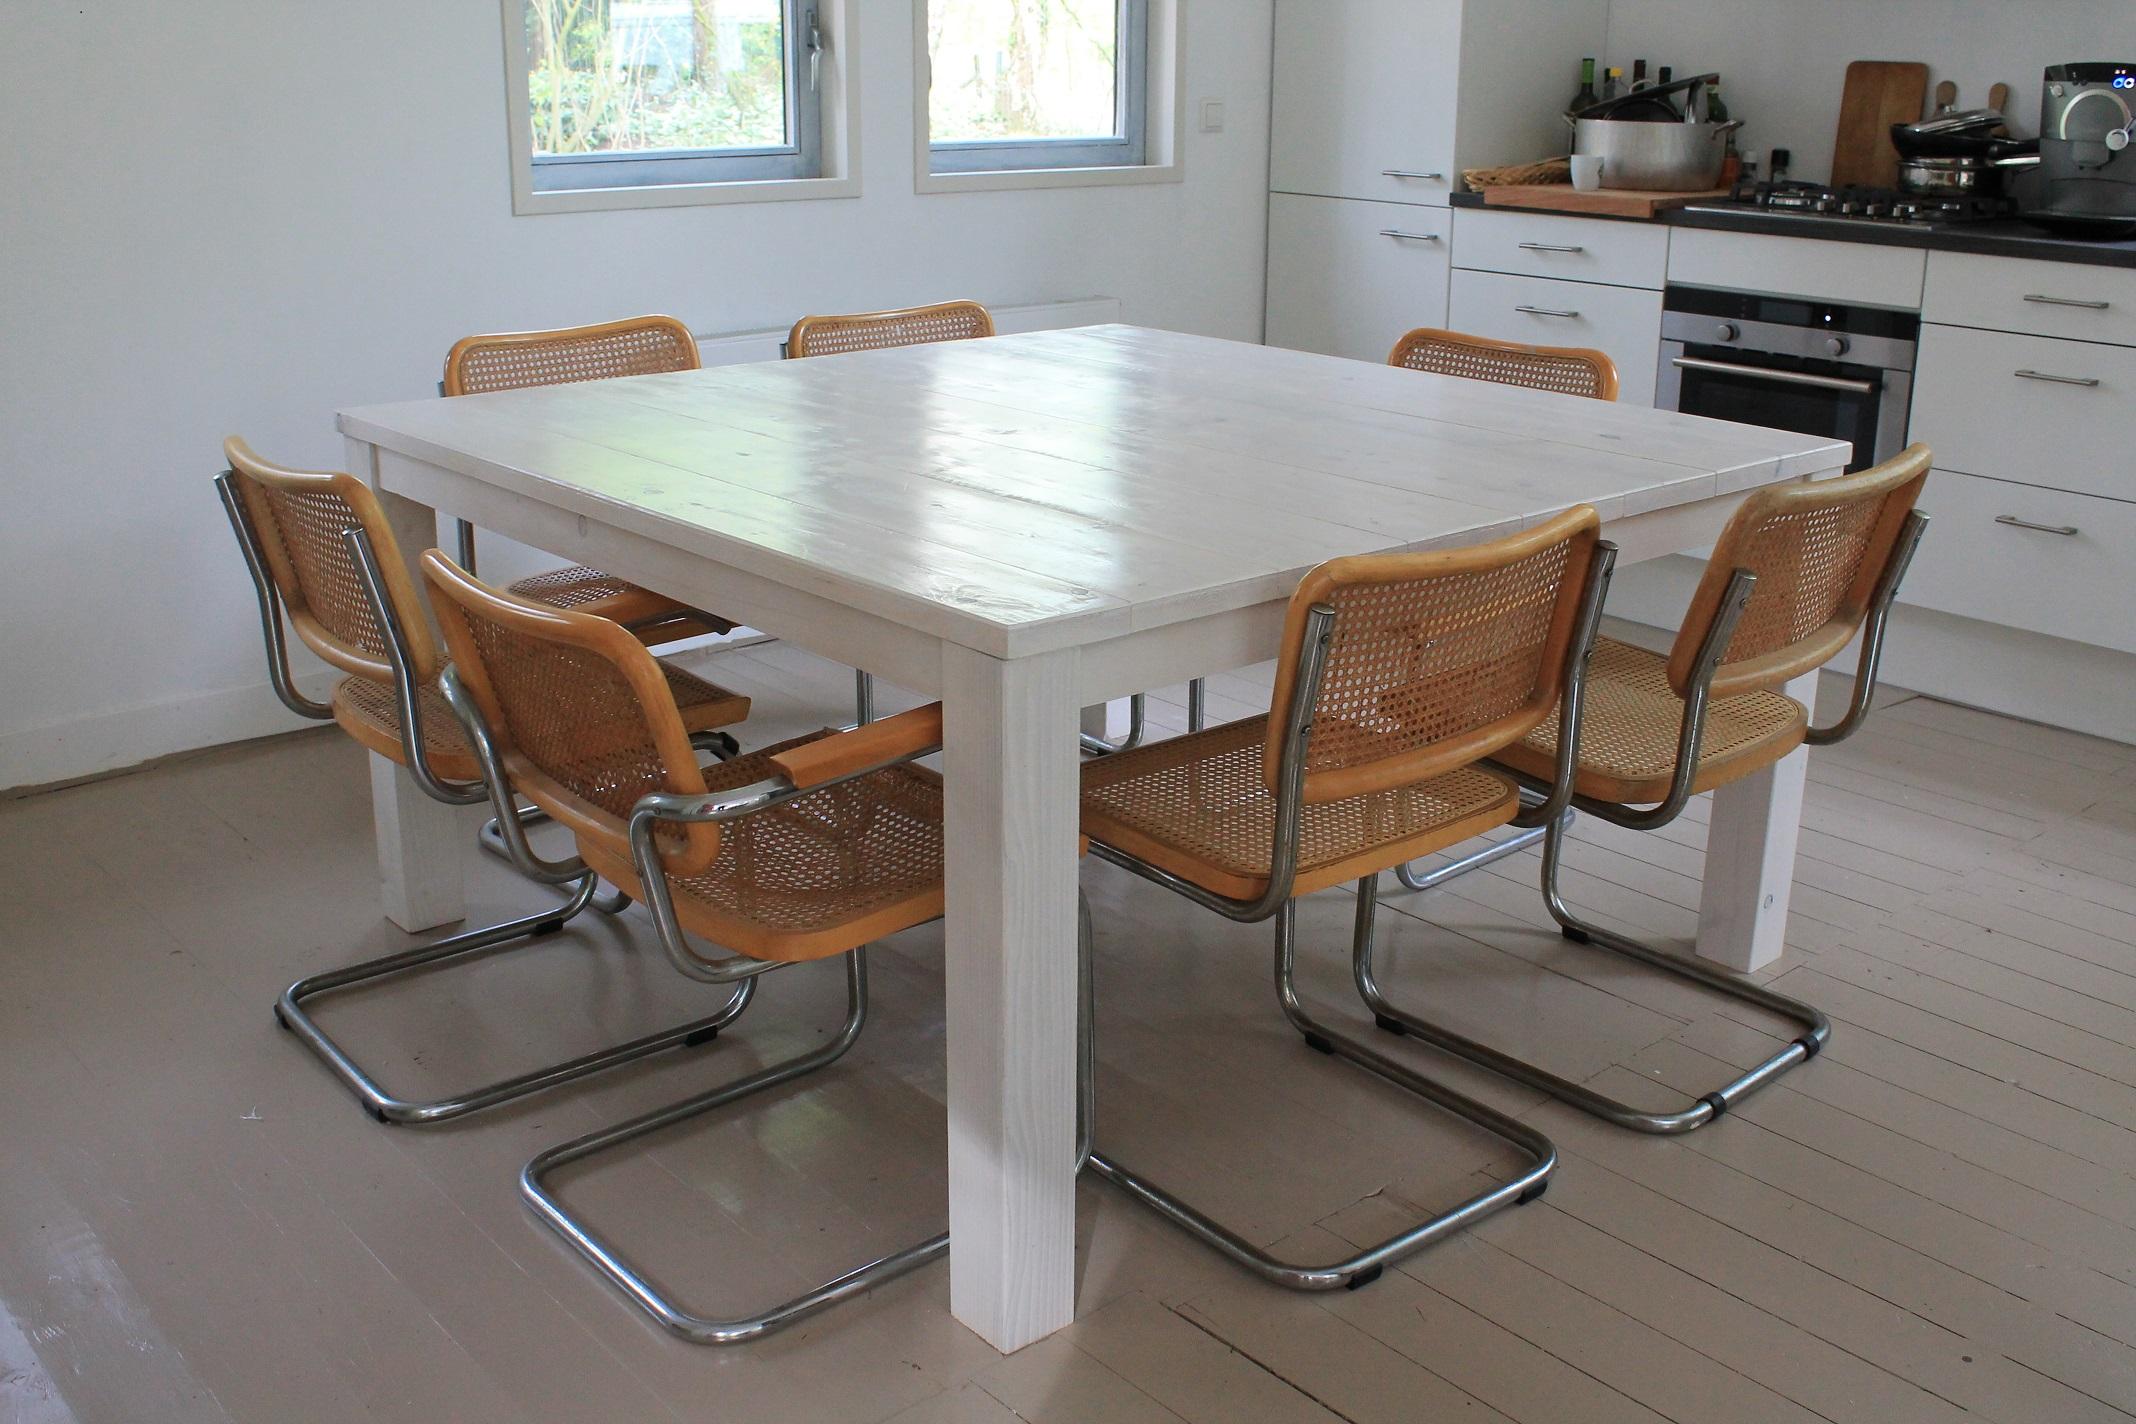 Eetkamertafel Vierkant Wit : Eettafel vierkant